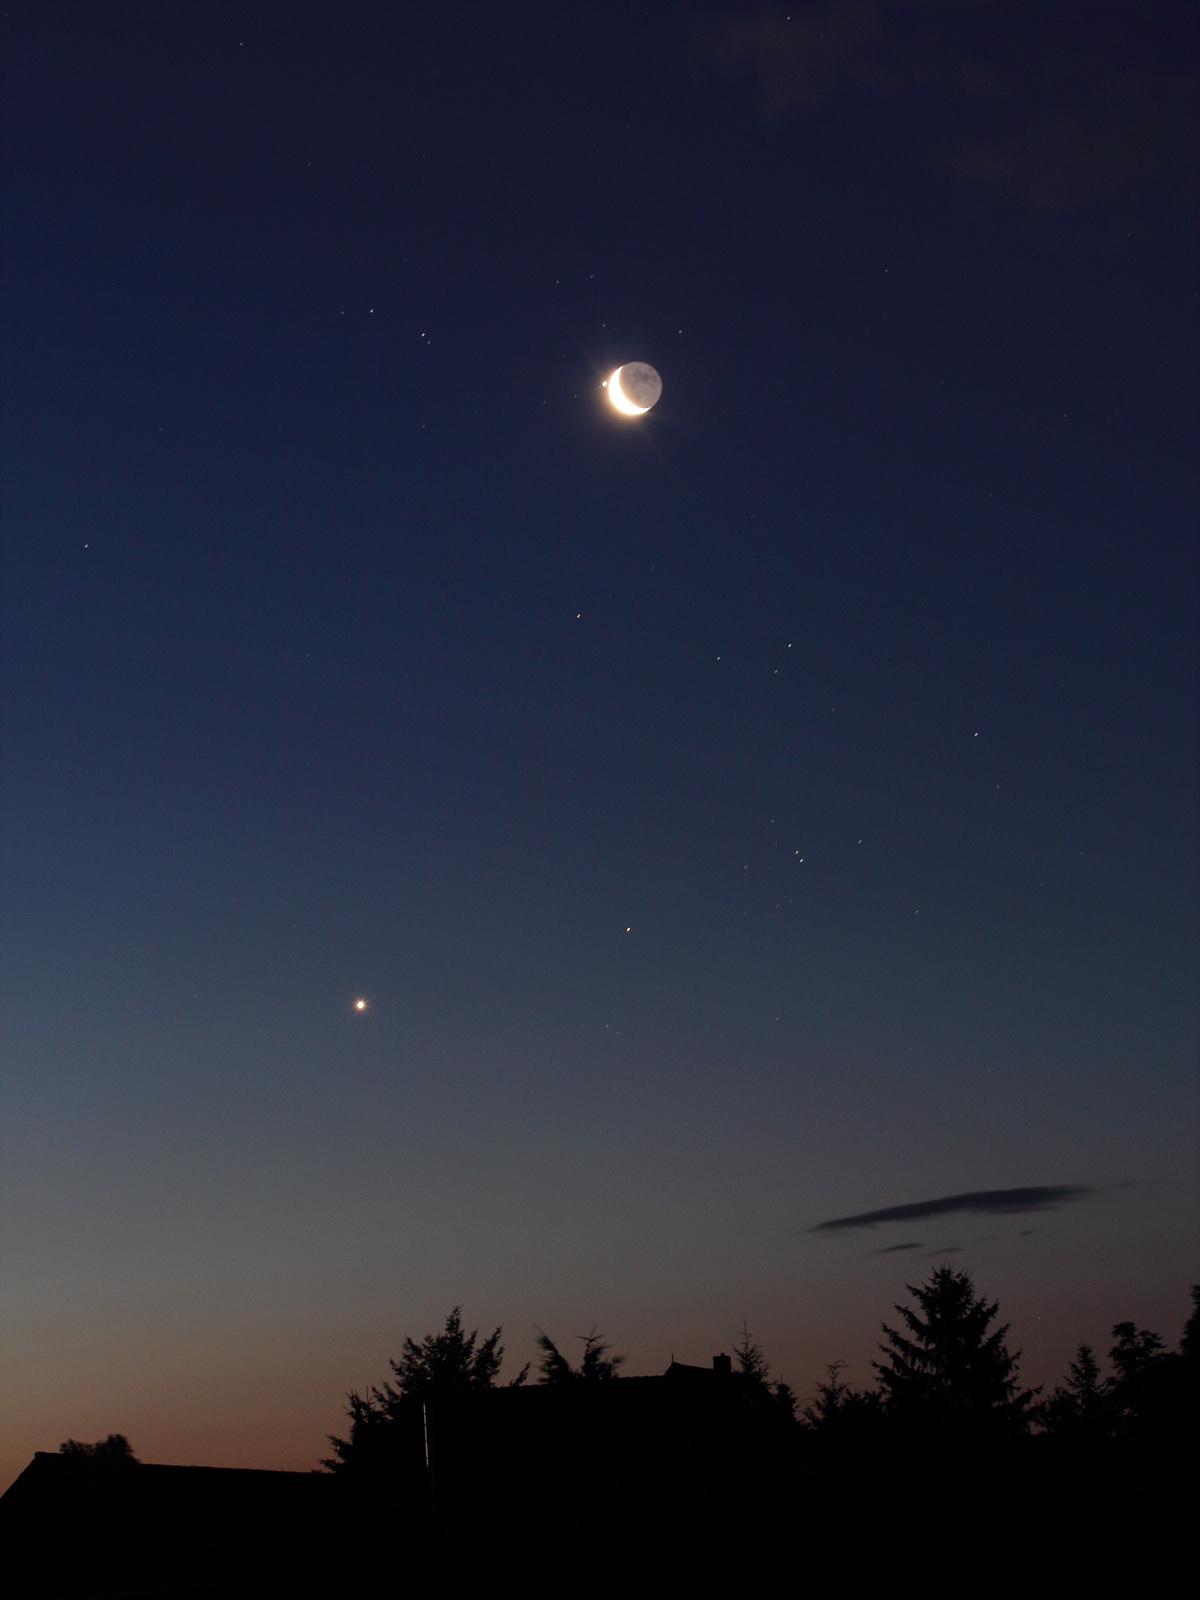 [Bild: K_Mond_Planeten_120715.jpg?m=1342432136]